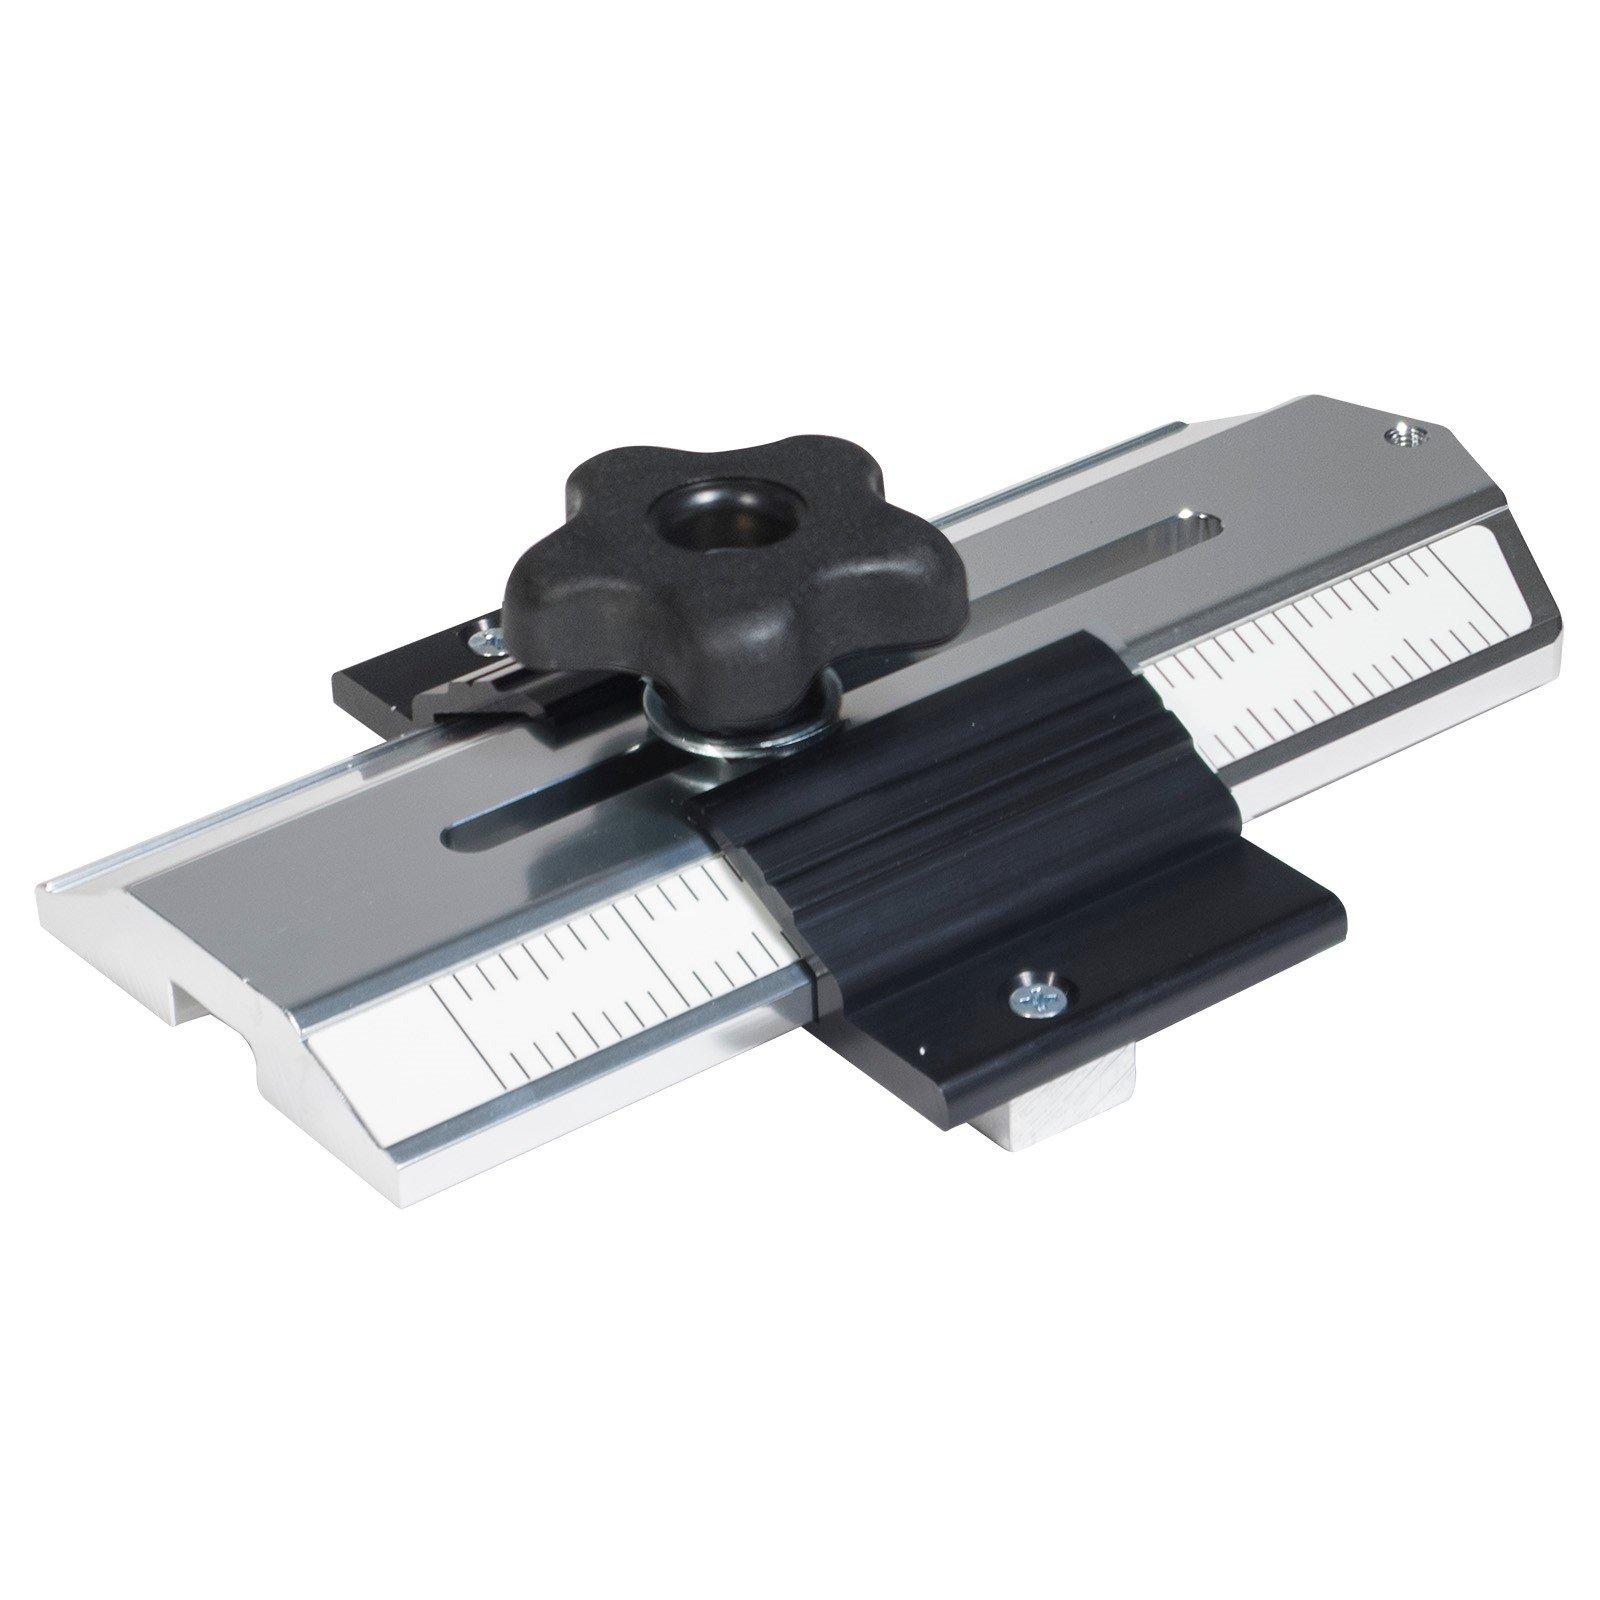 POWERTEC 71059 Thin Rip Table Saw Jig